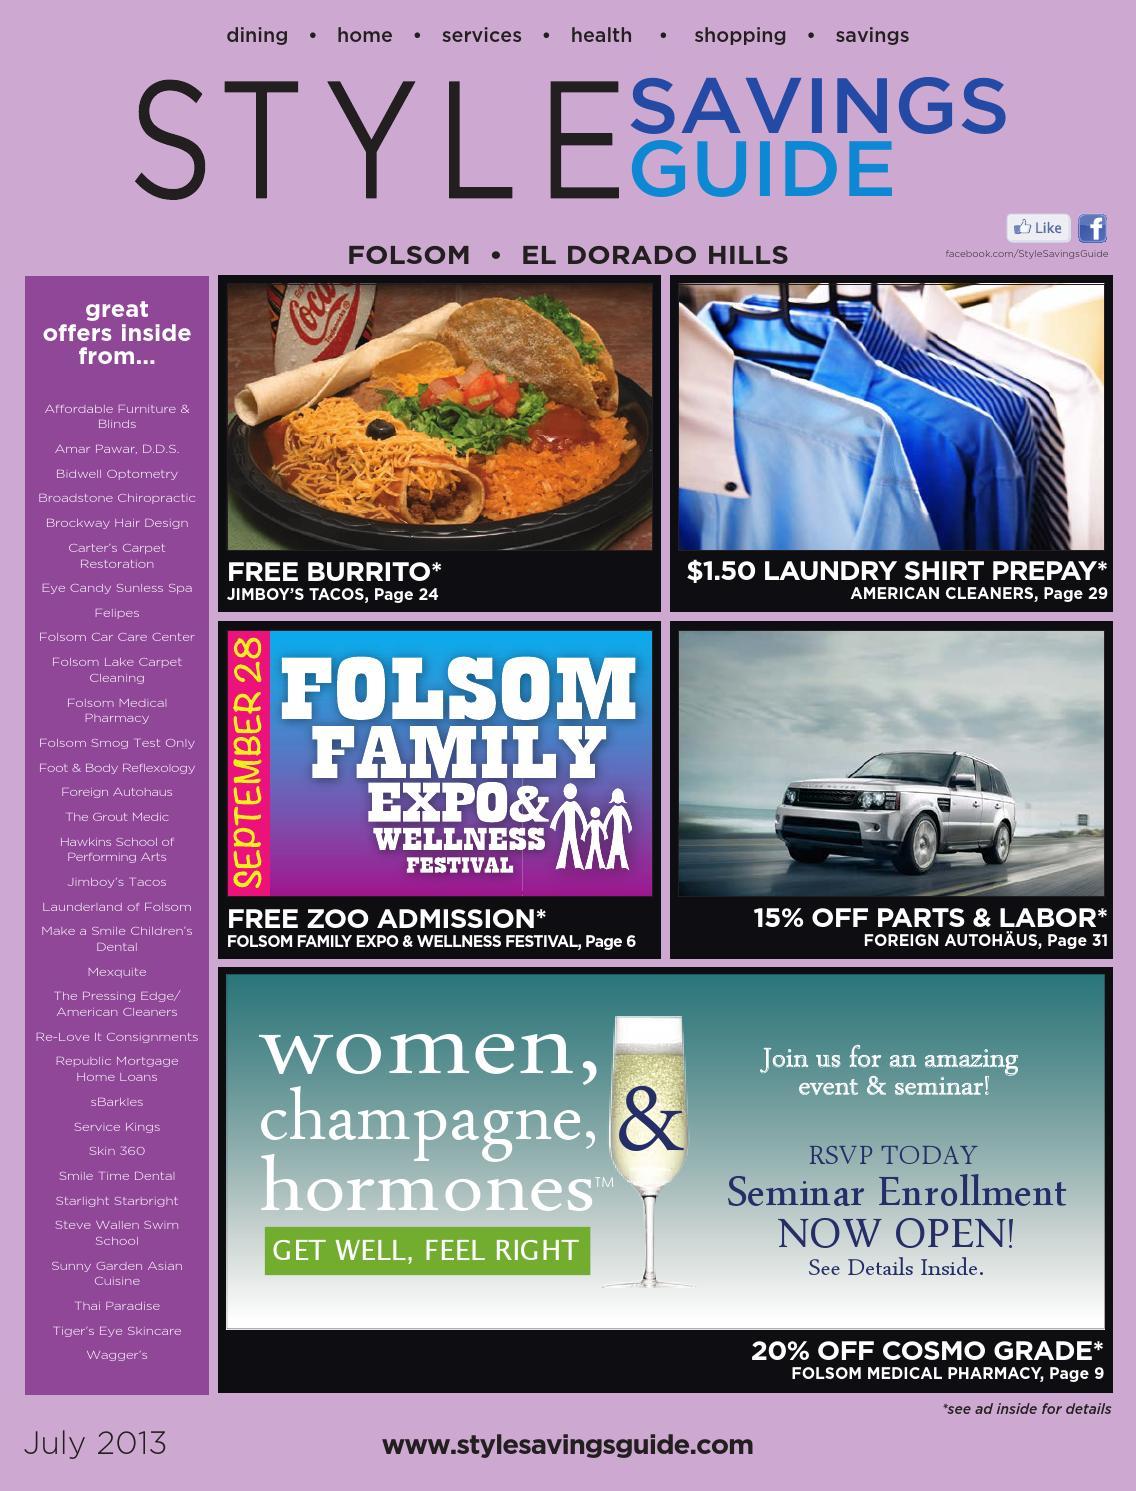 Style Savings Guide Folsom El Dorado Hills July Aug